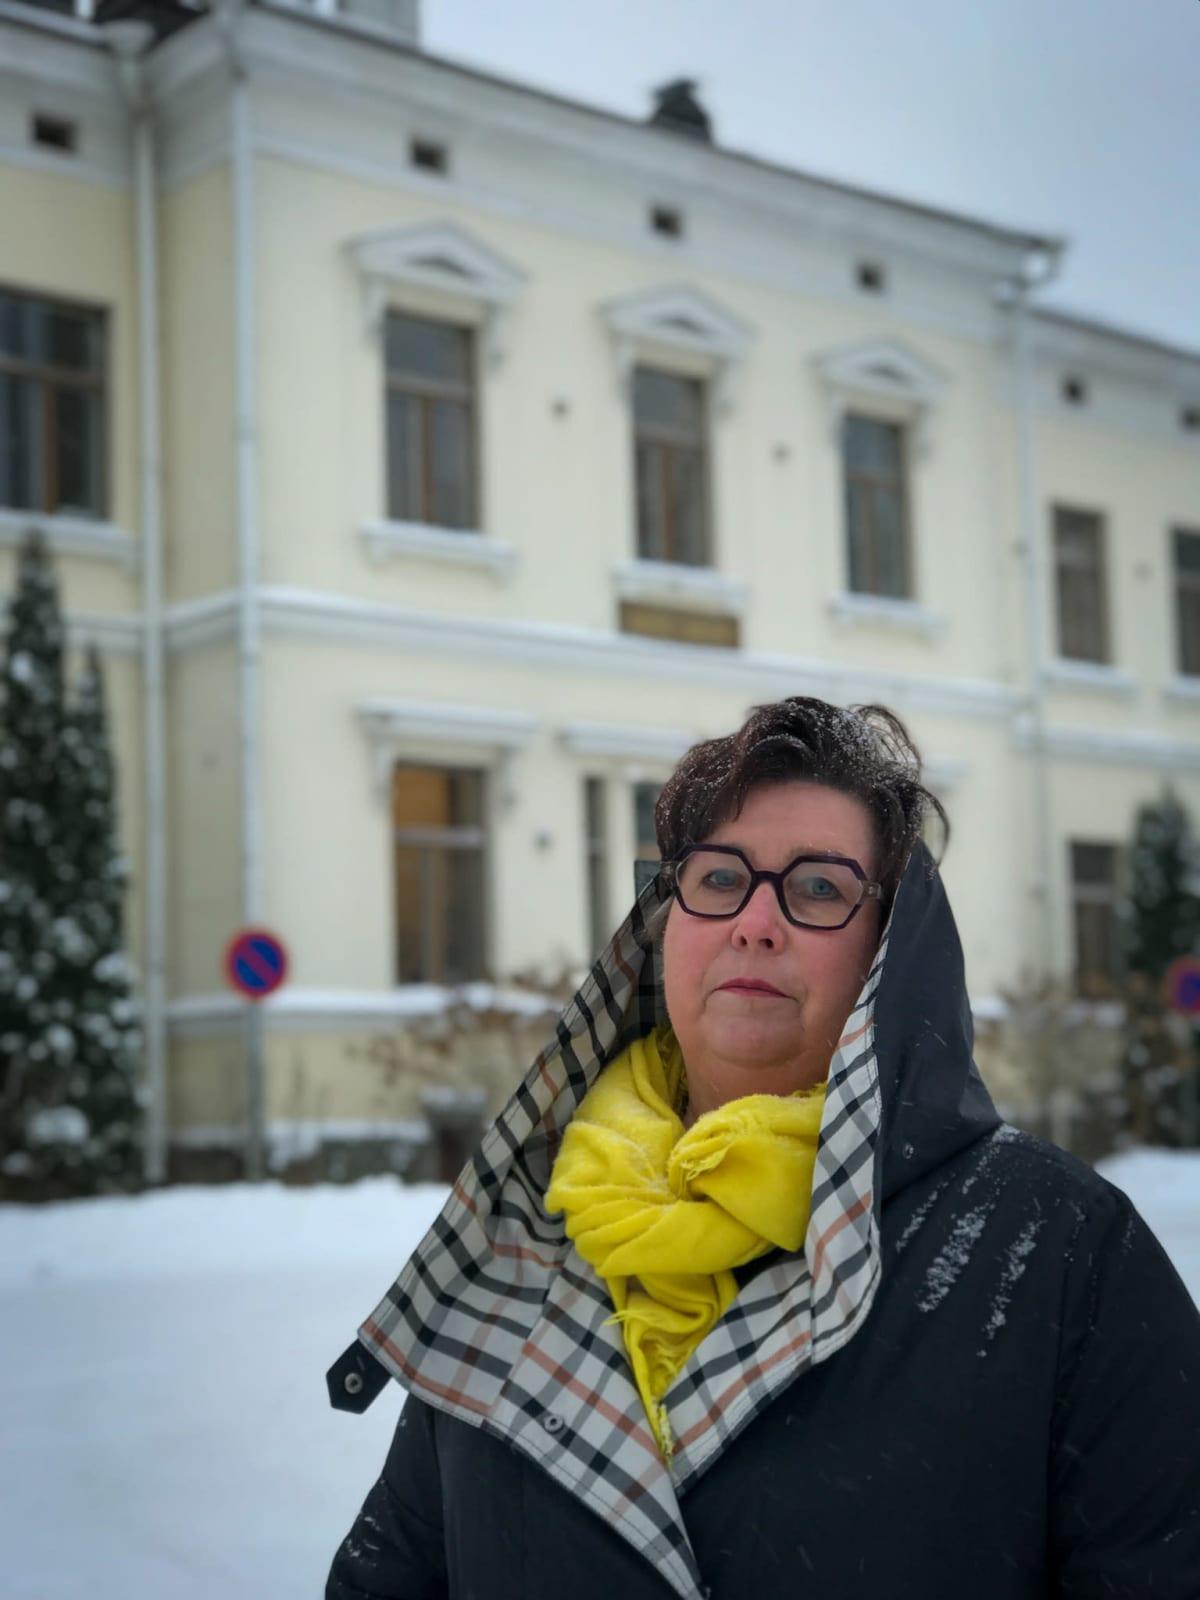 Tampereen psykiatrian toimialajohtaja Hanna-Mari Alanen